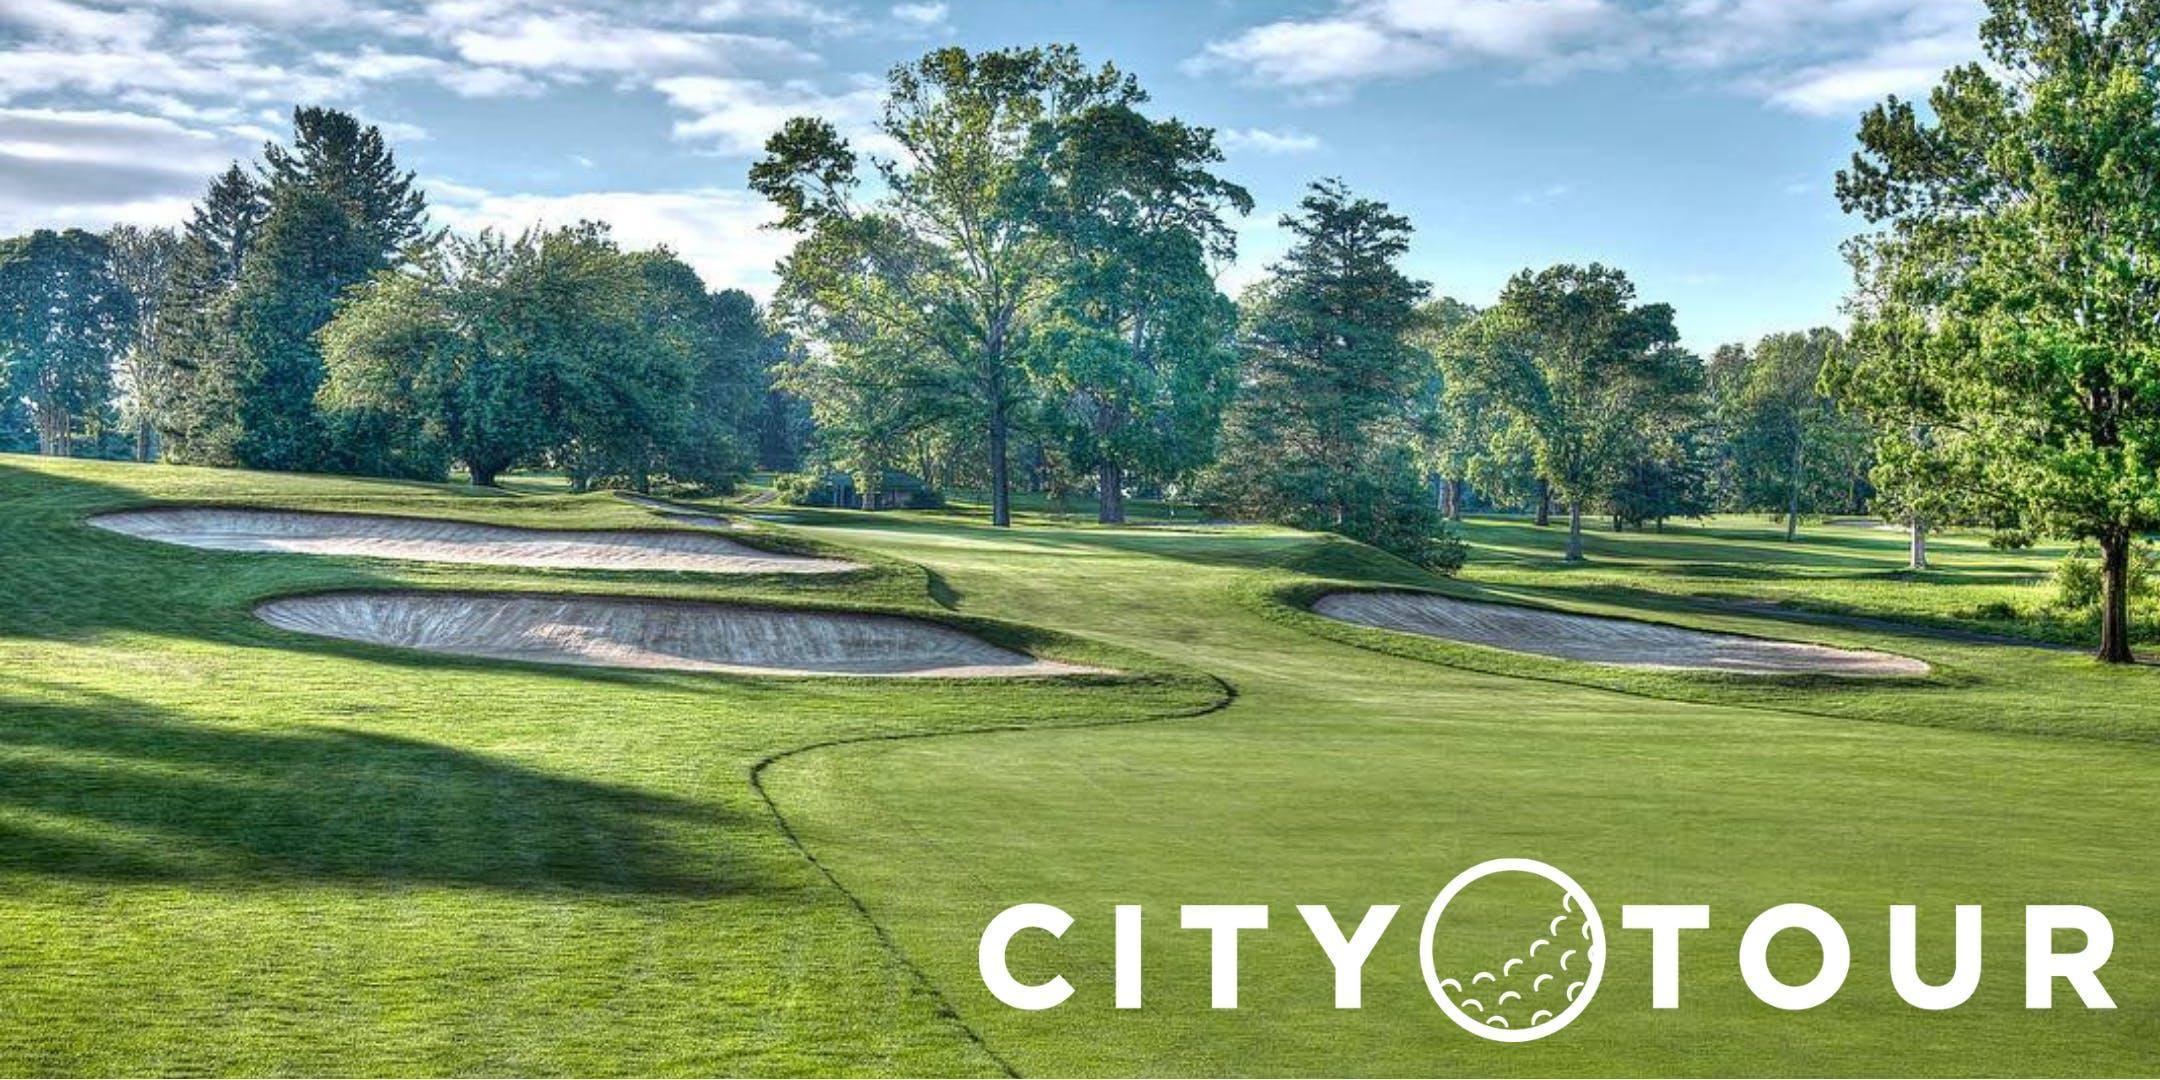 Philly City Tour - Seaview Golf Resort